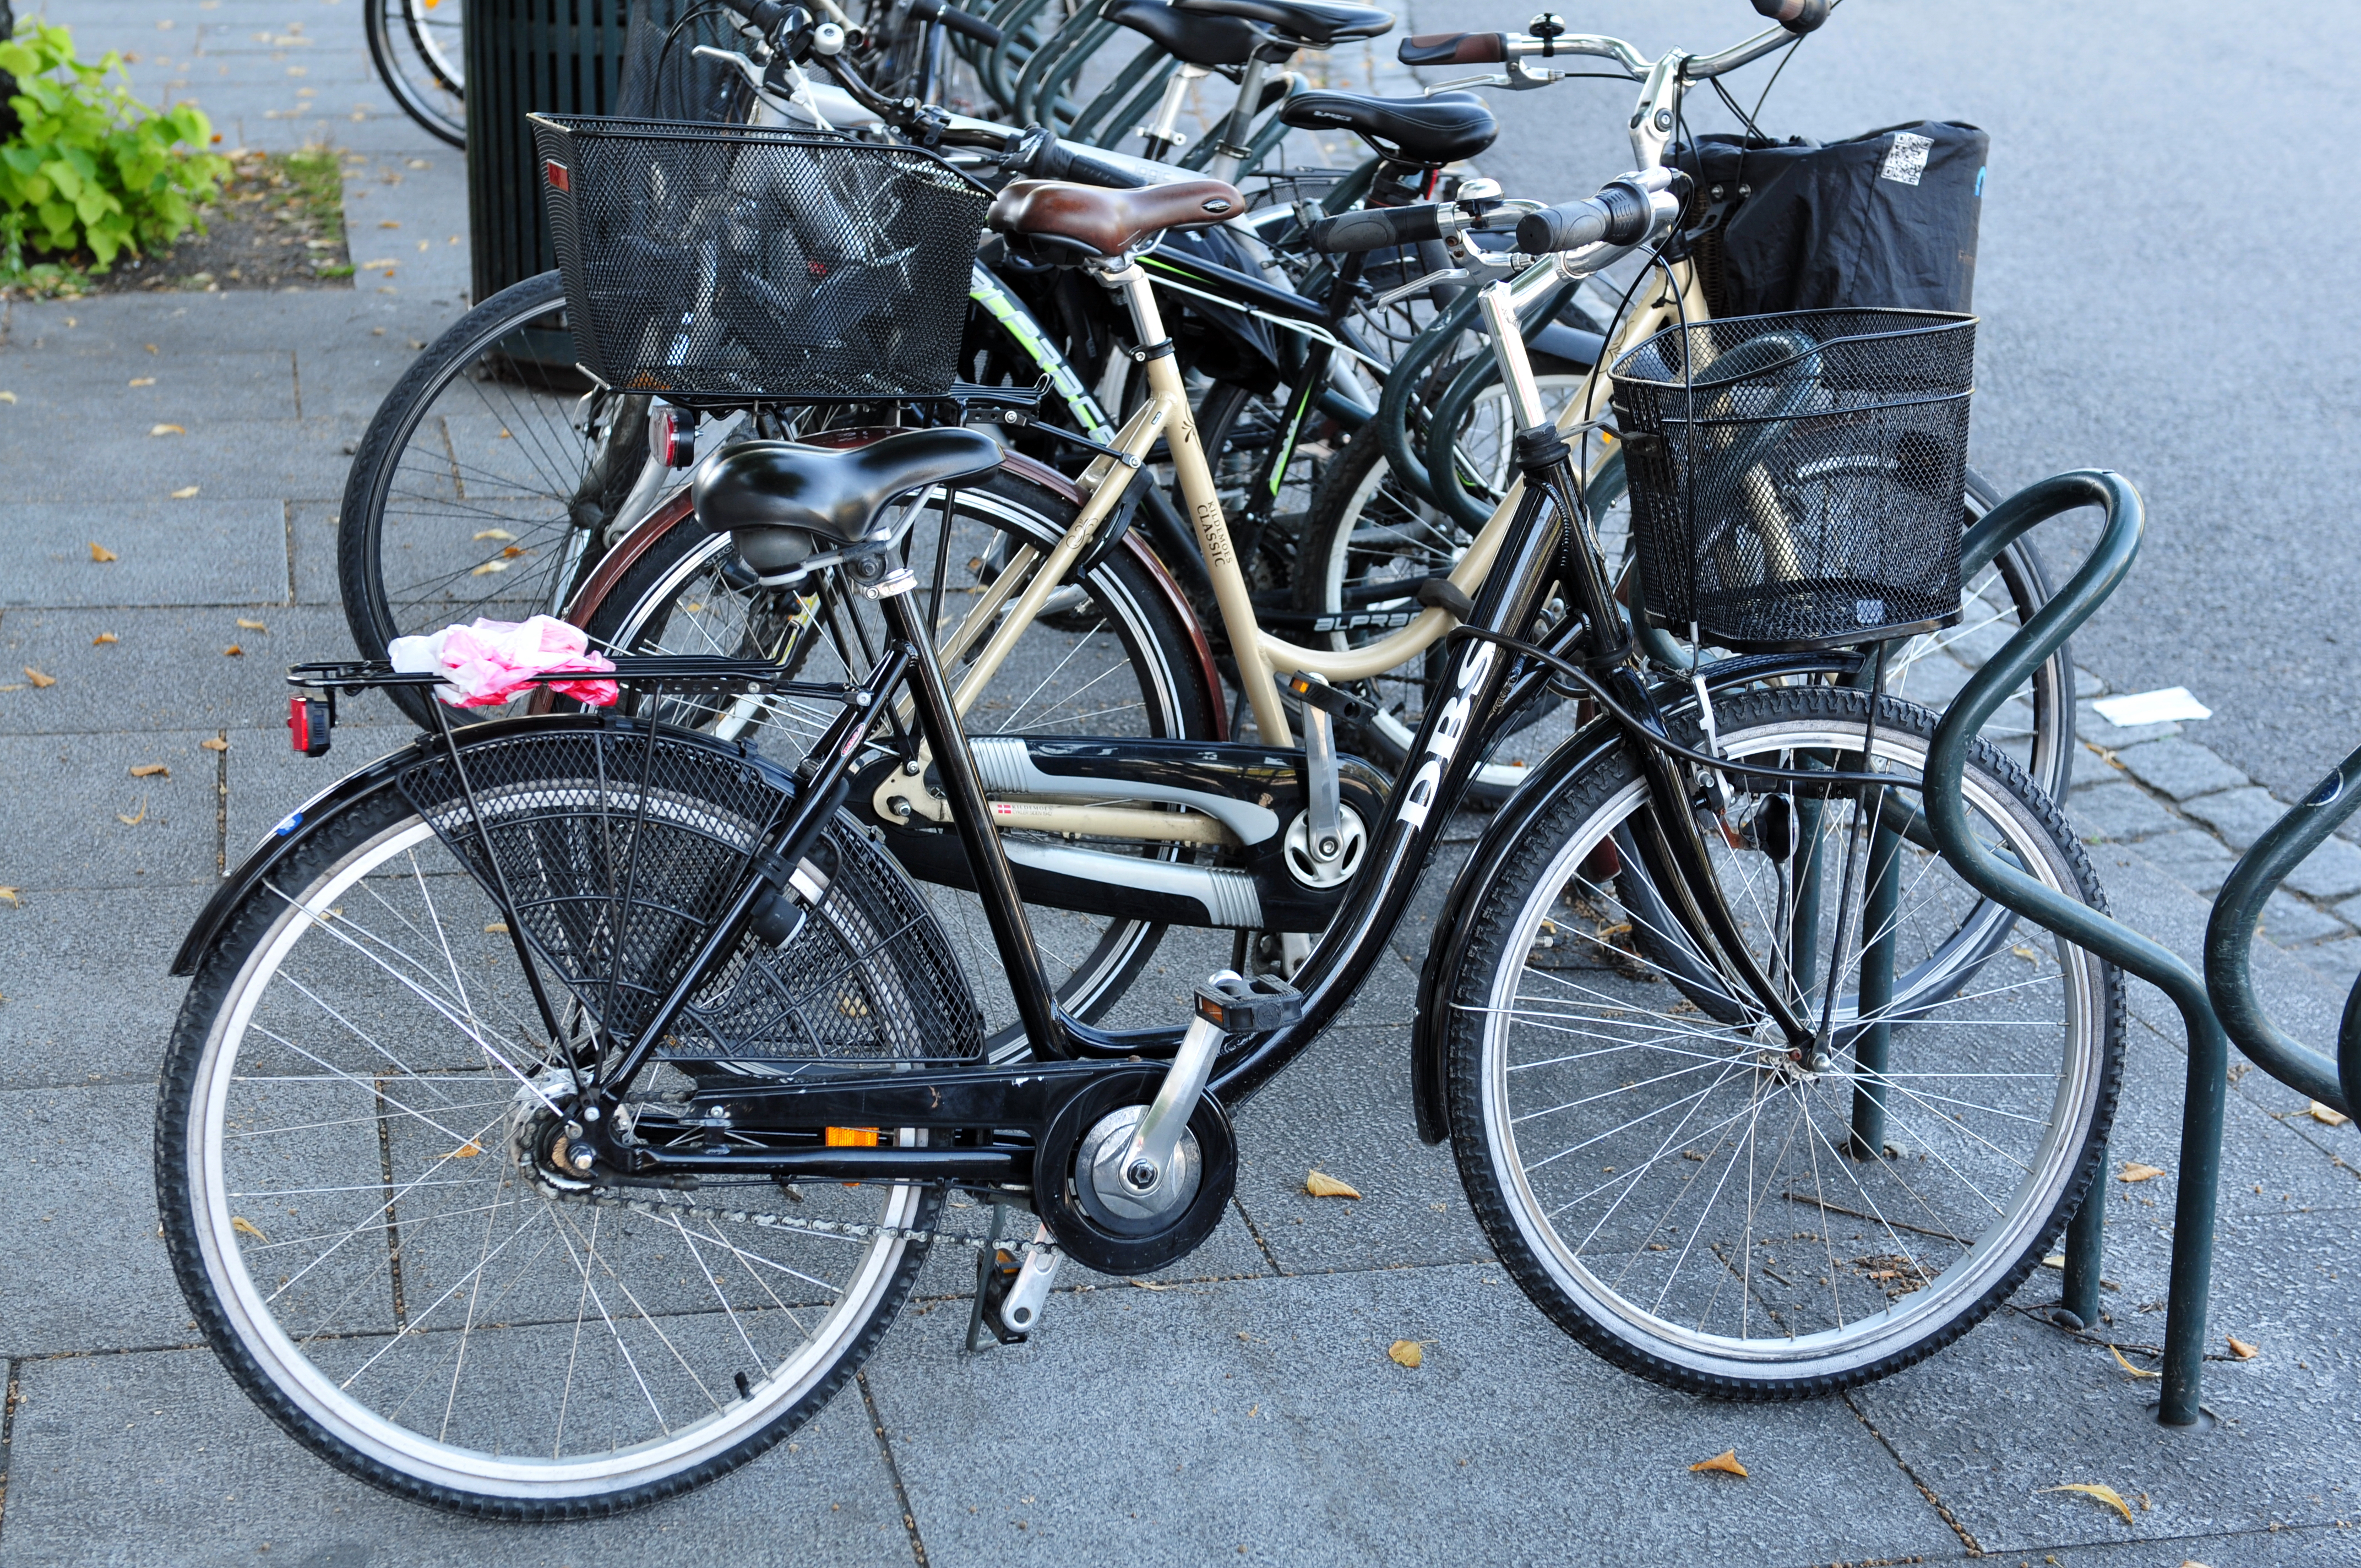 14-09-02-fahrrad-oslo-03.jpg